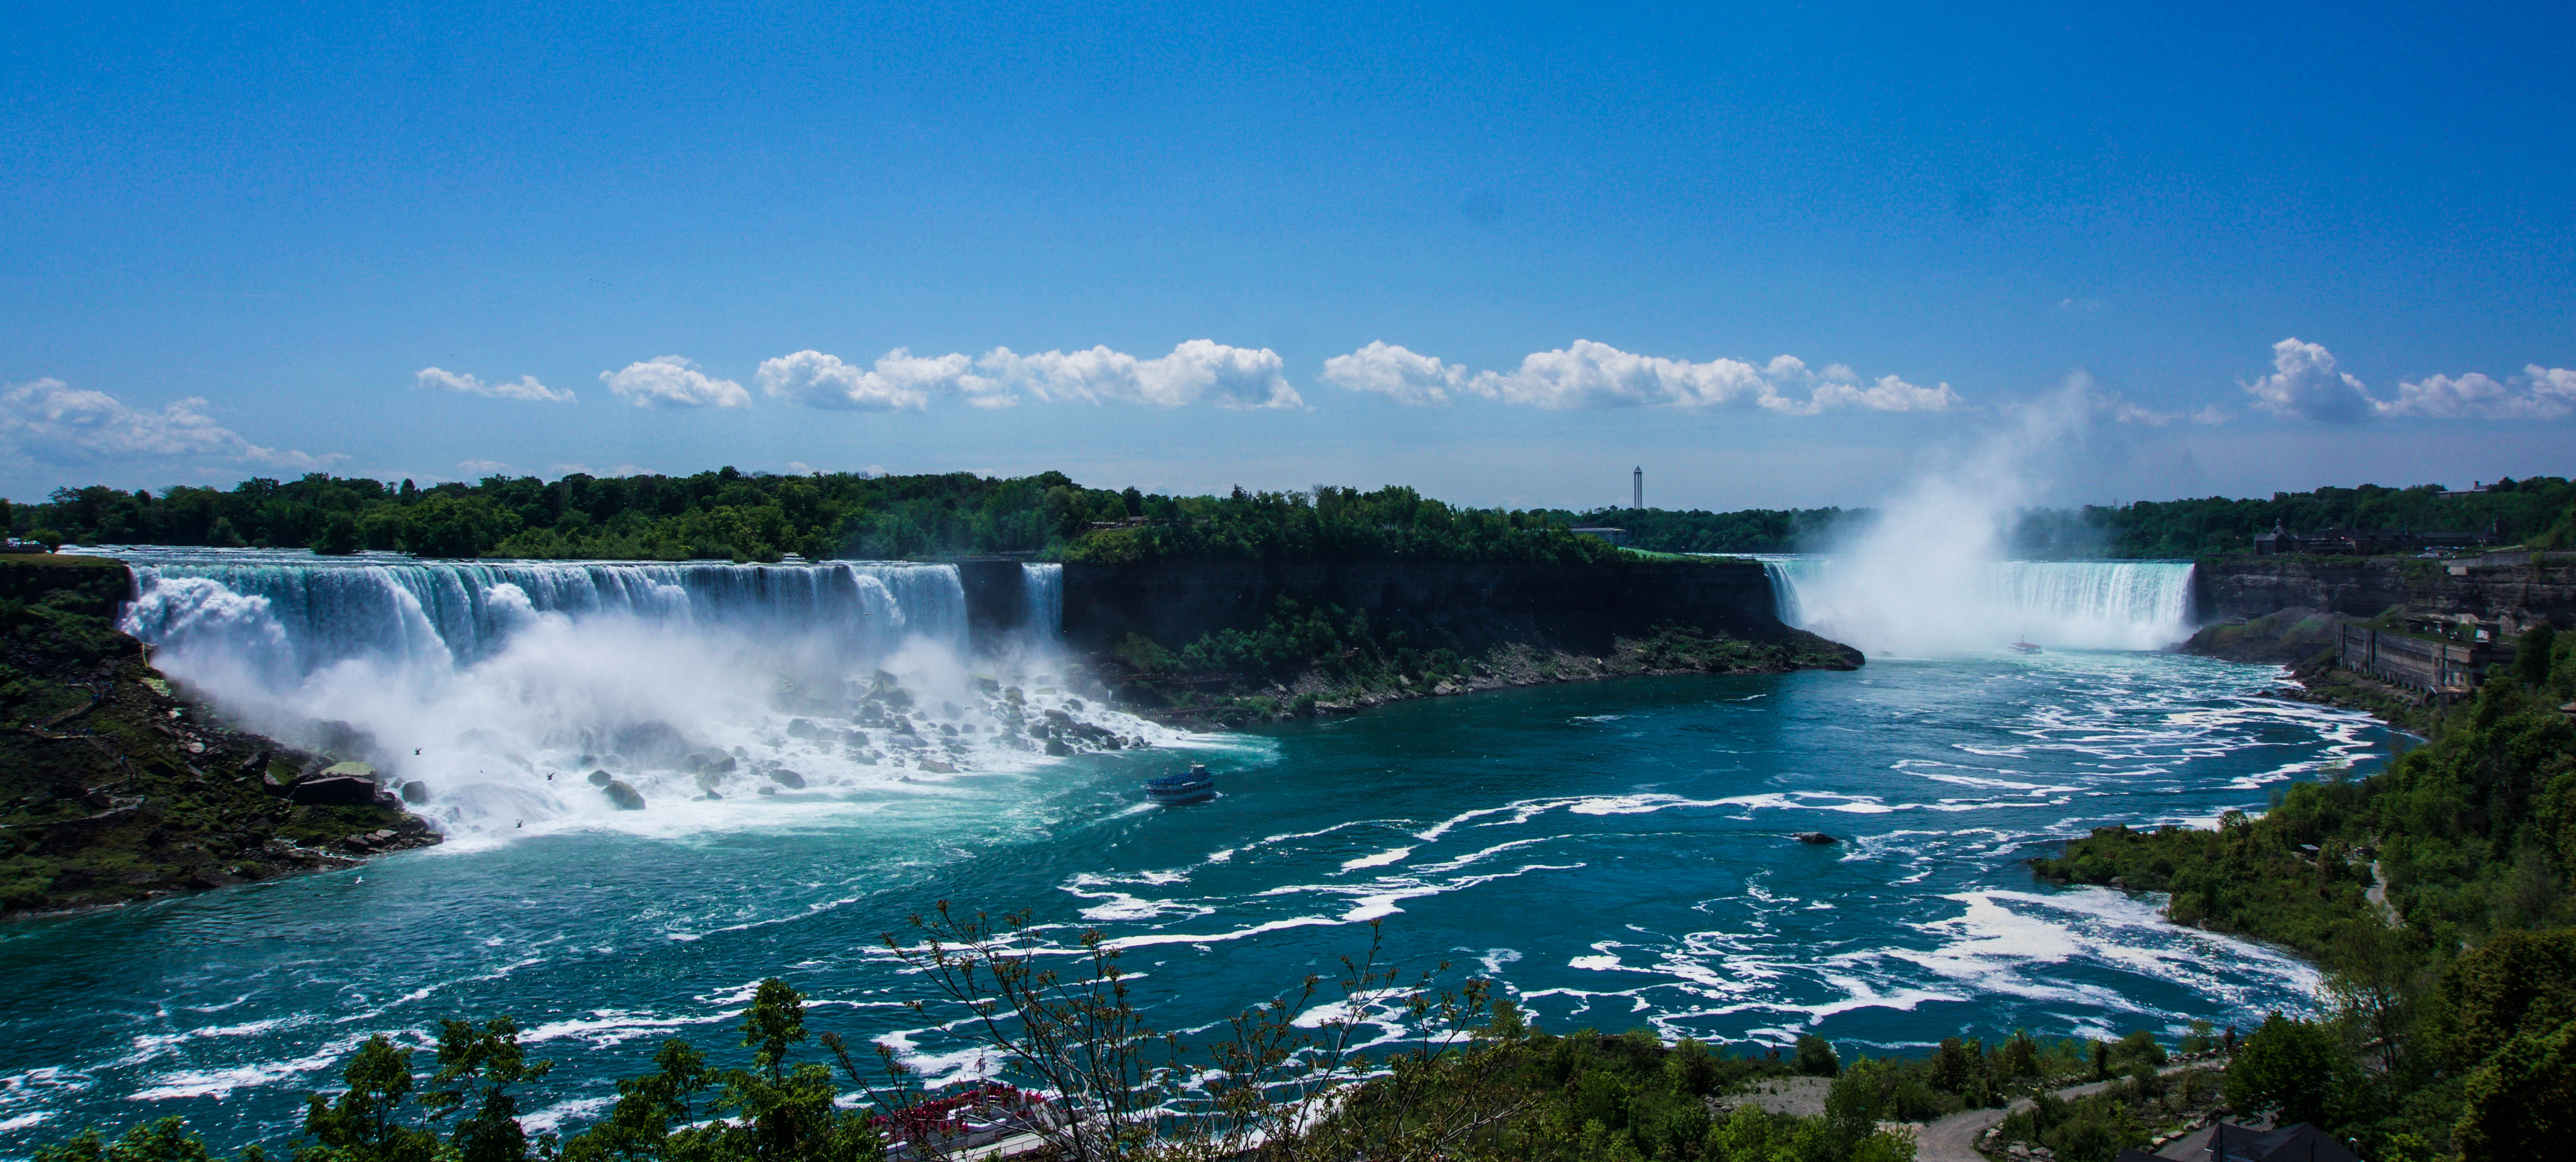 Niagara Falls on the Canadian side